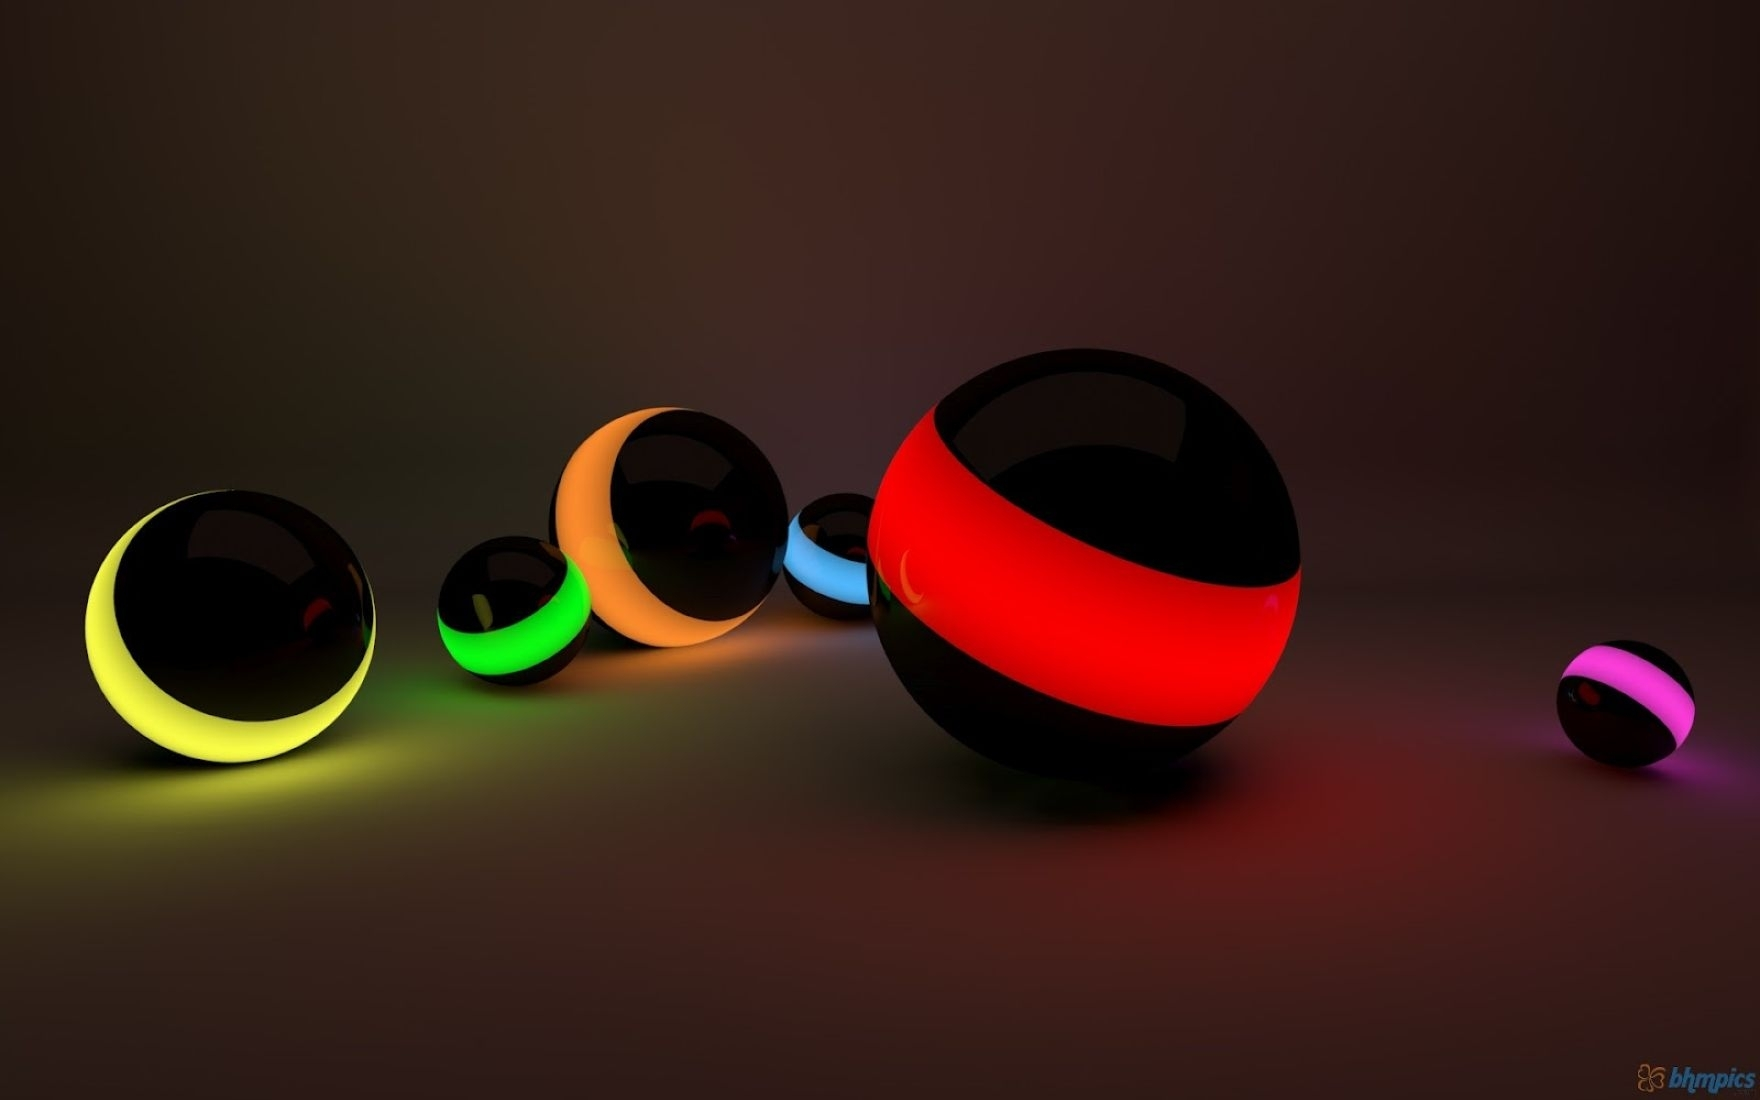 3d hd colorful ball for laptop free download wallpaper: desktop hd